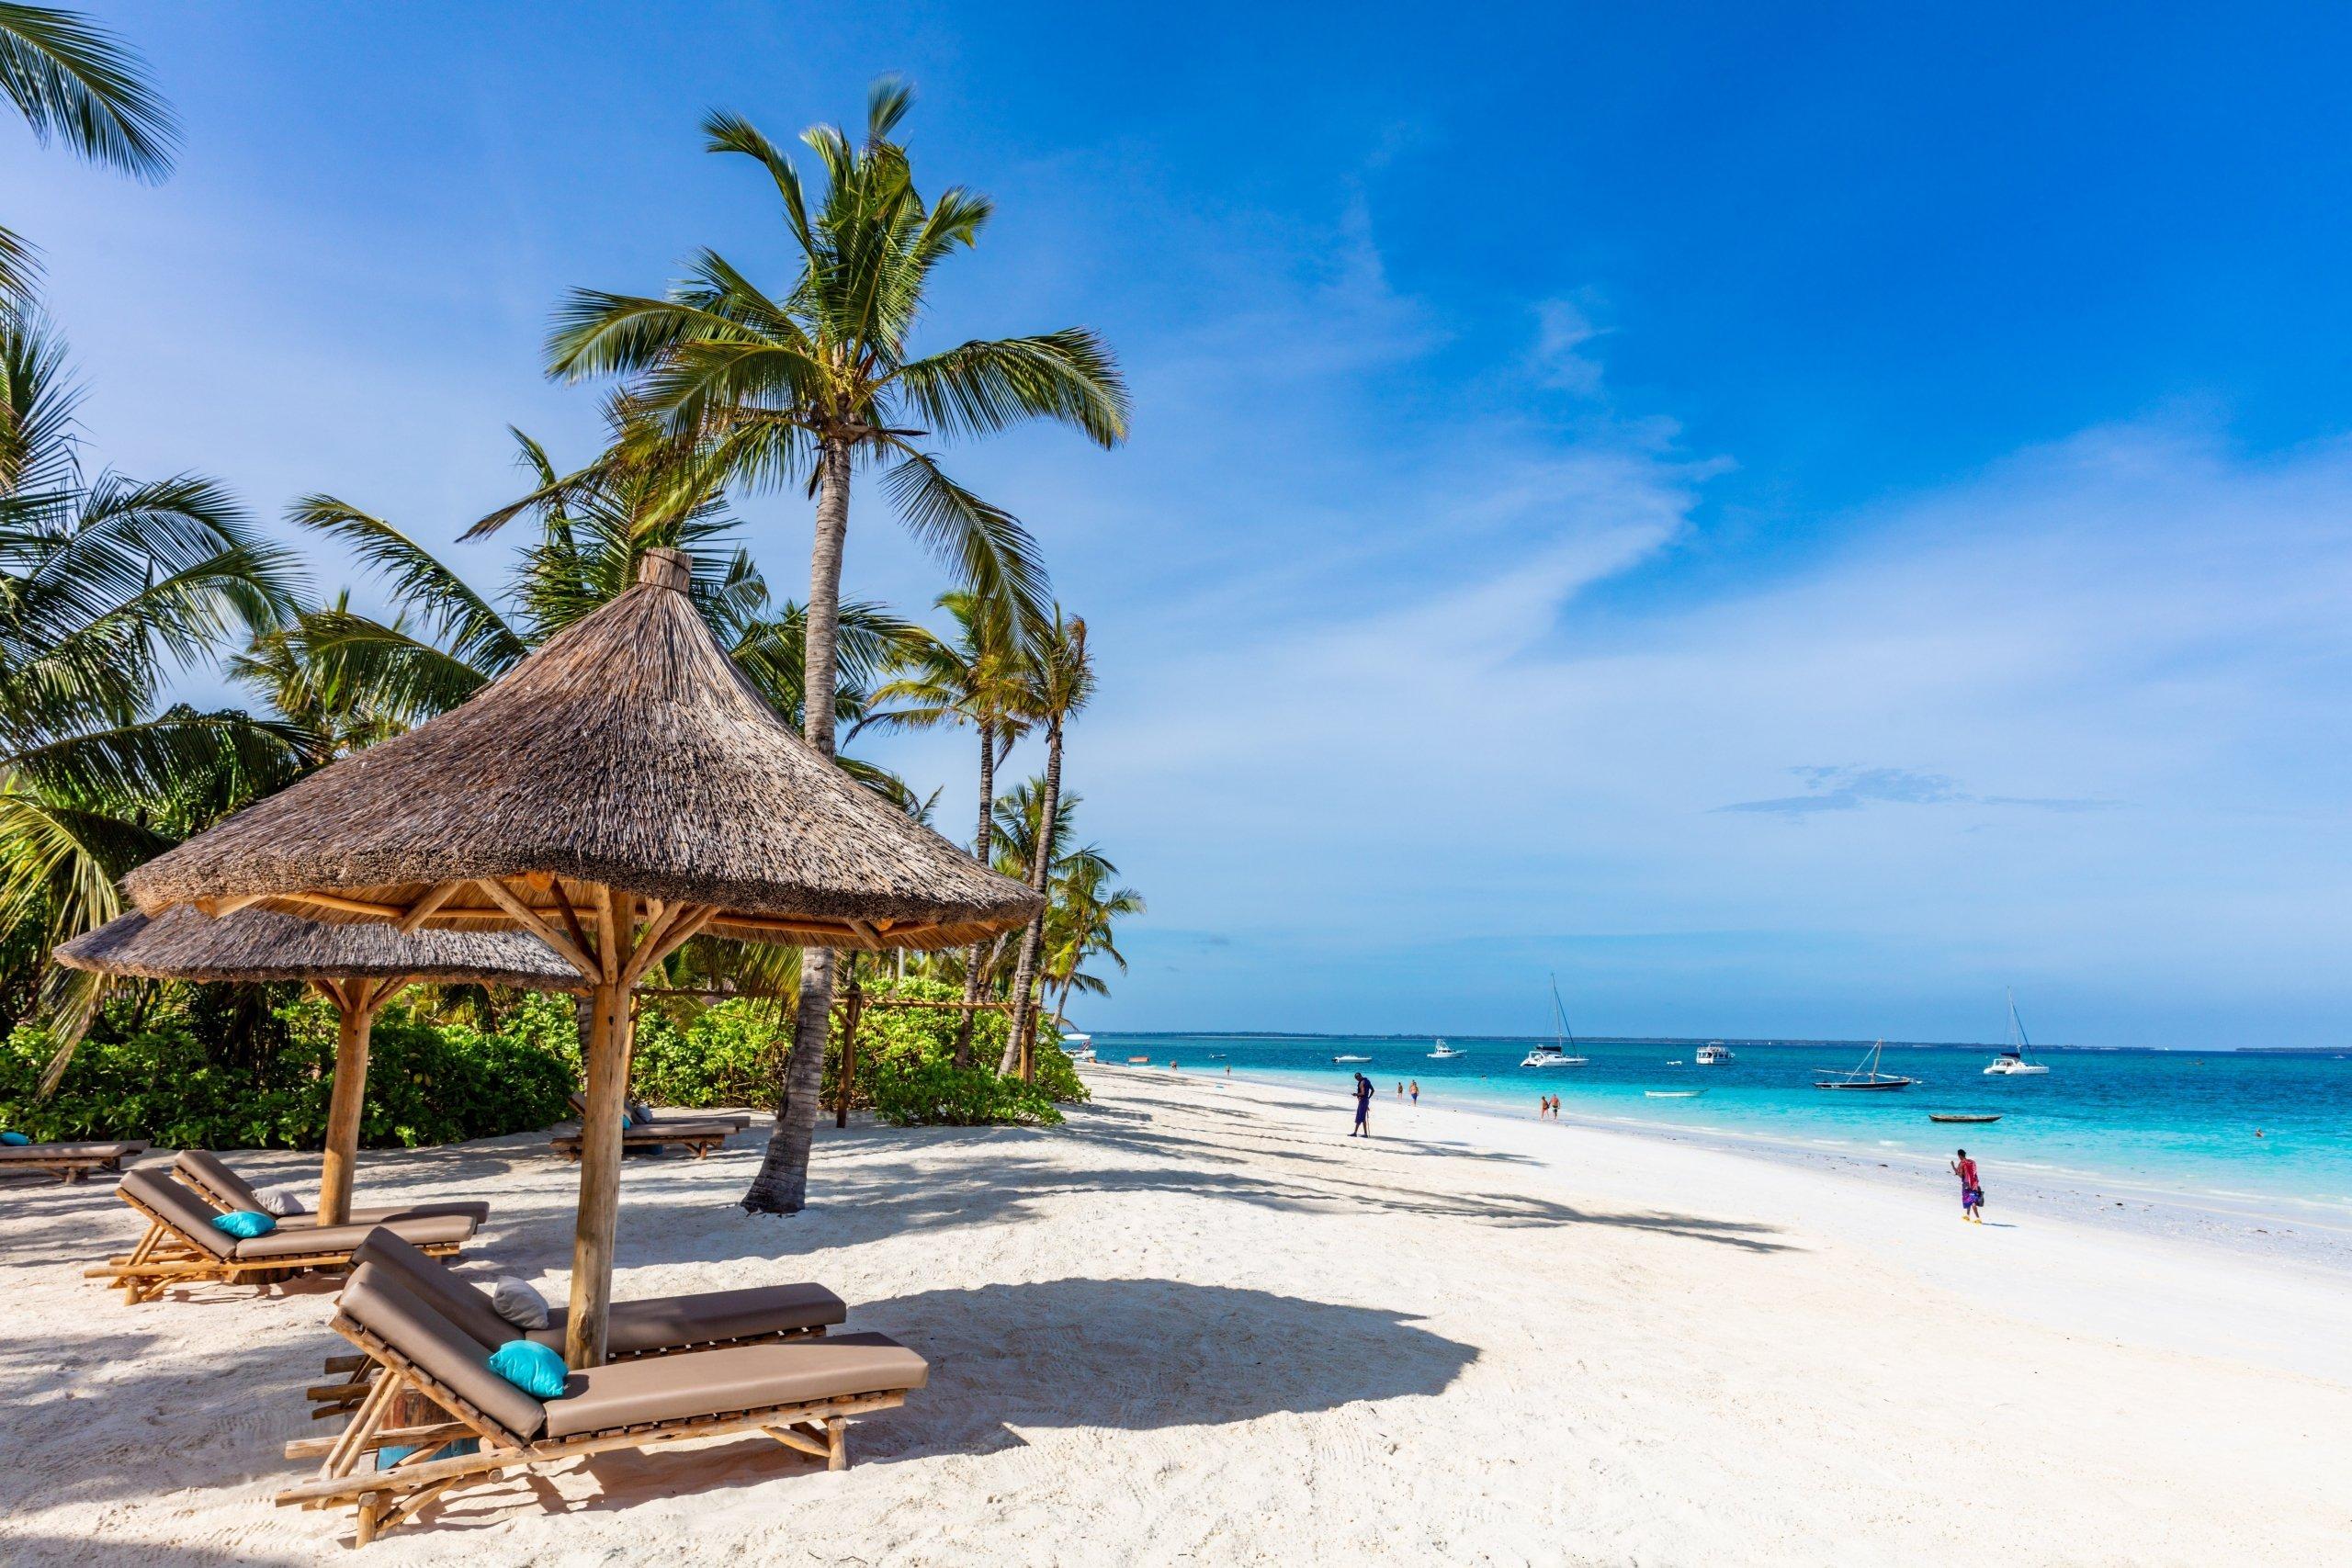 Choosing the Right Spot for Your Zanzibar Island Break